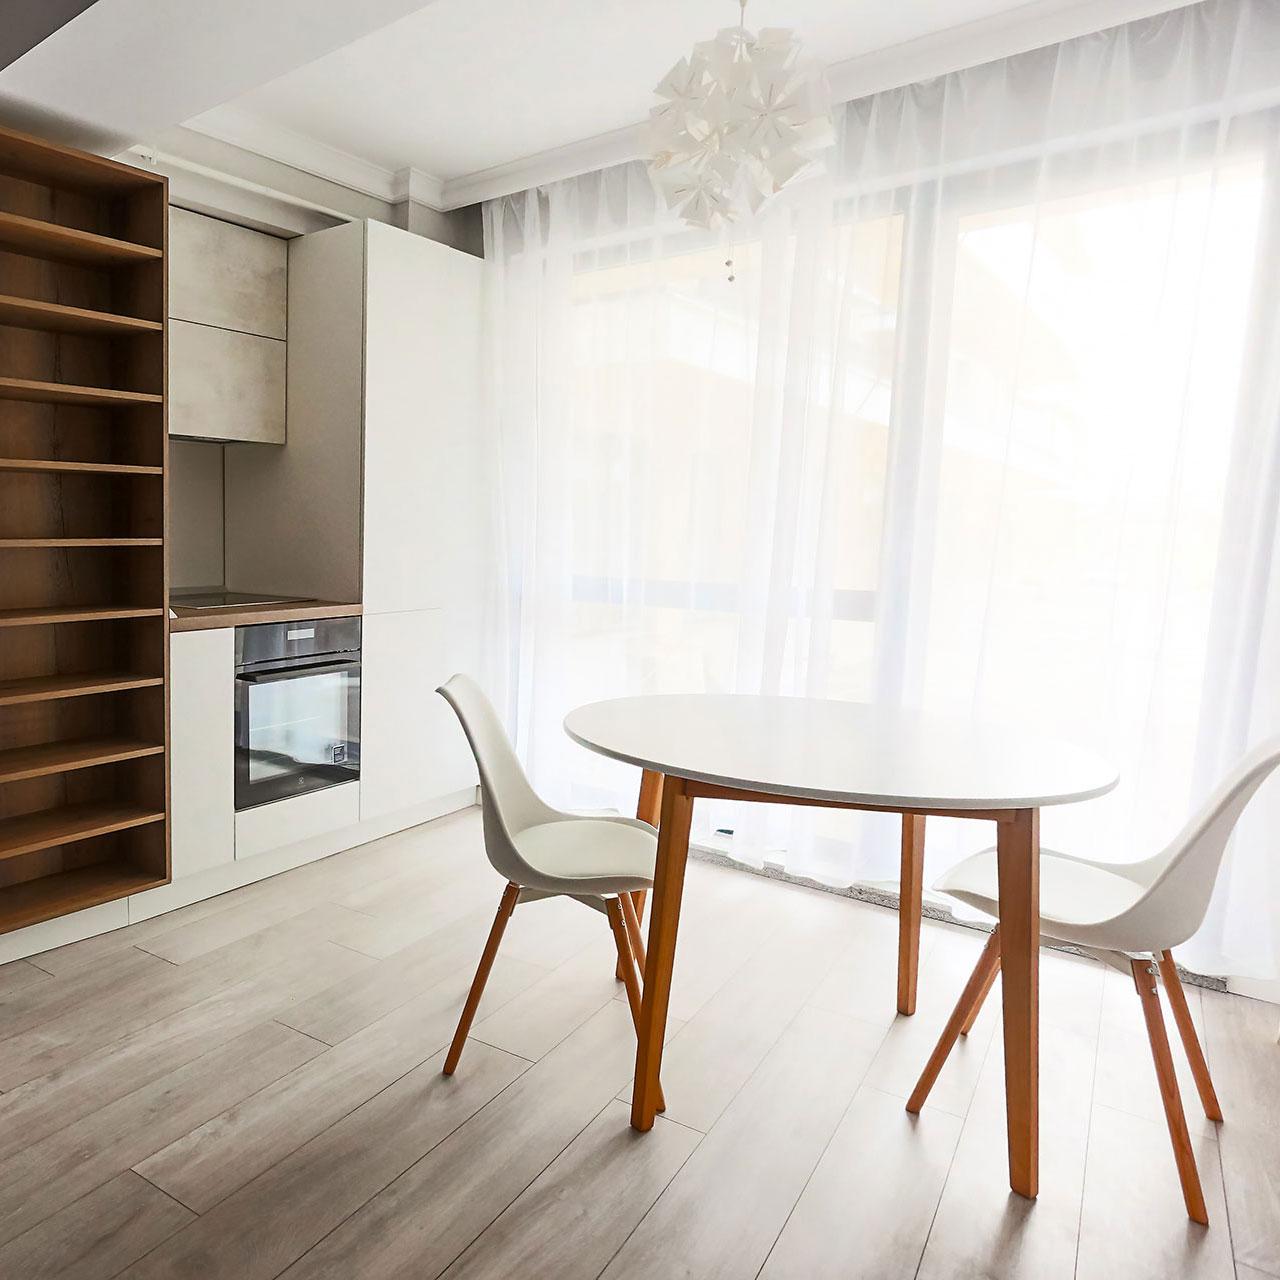 Apartamente de vanzare Bucuresti - Catedral Residence - Marriott, Piata Unirii, 13 Septembrie, Izvor - G2 - 3